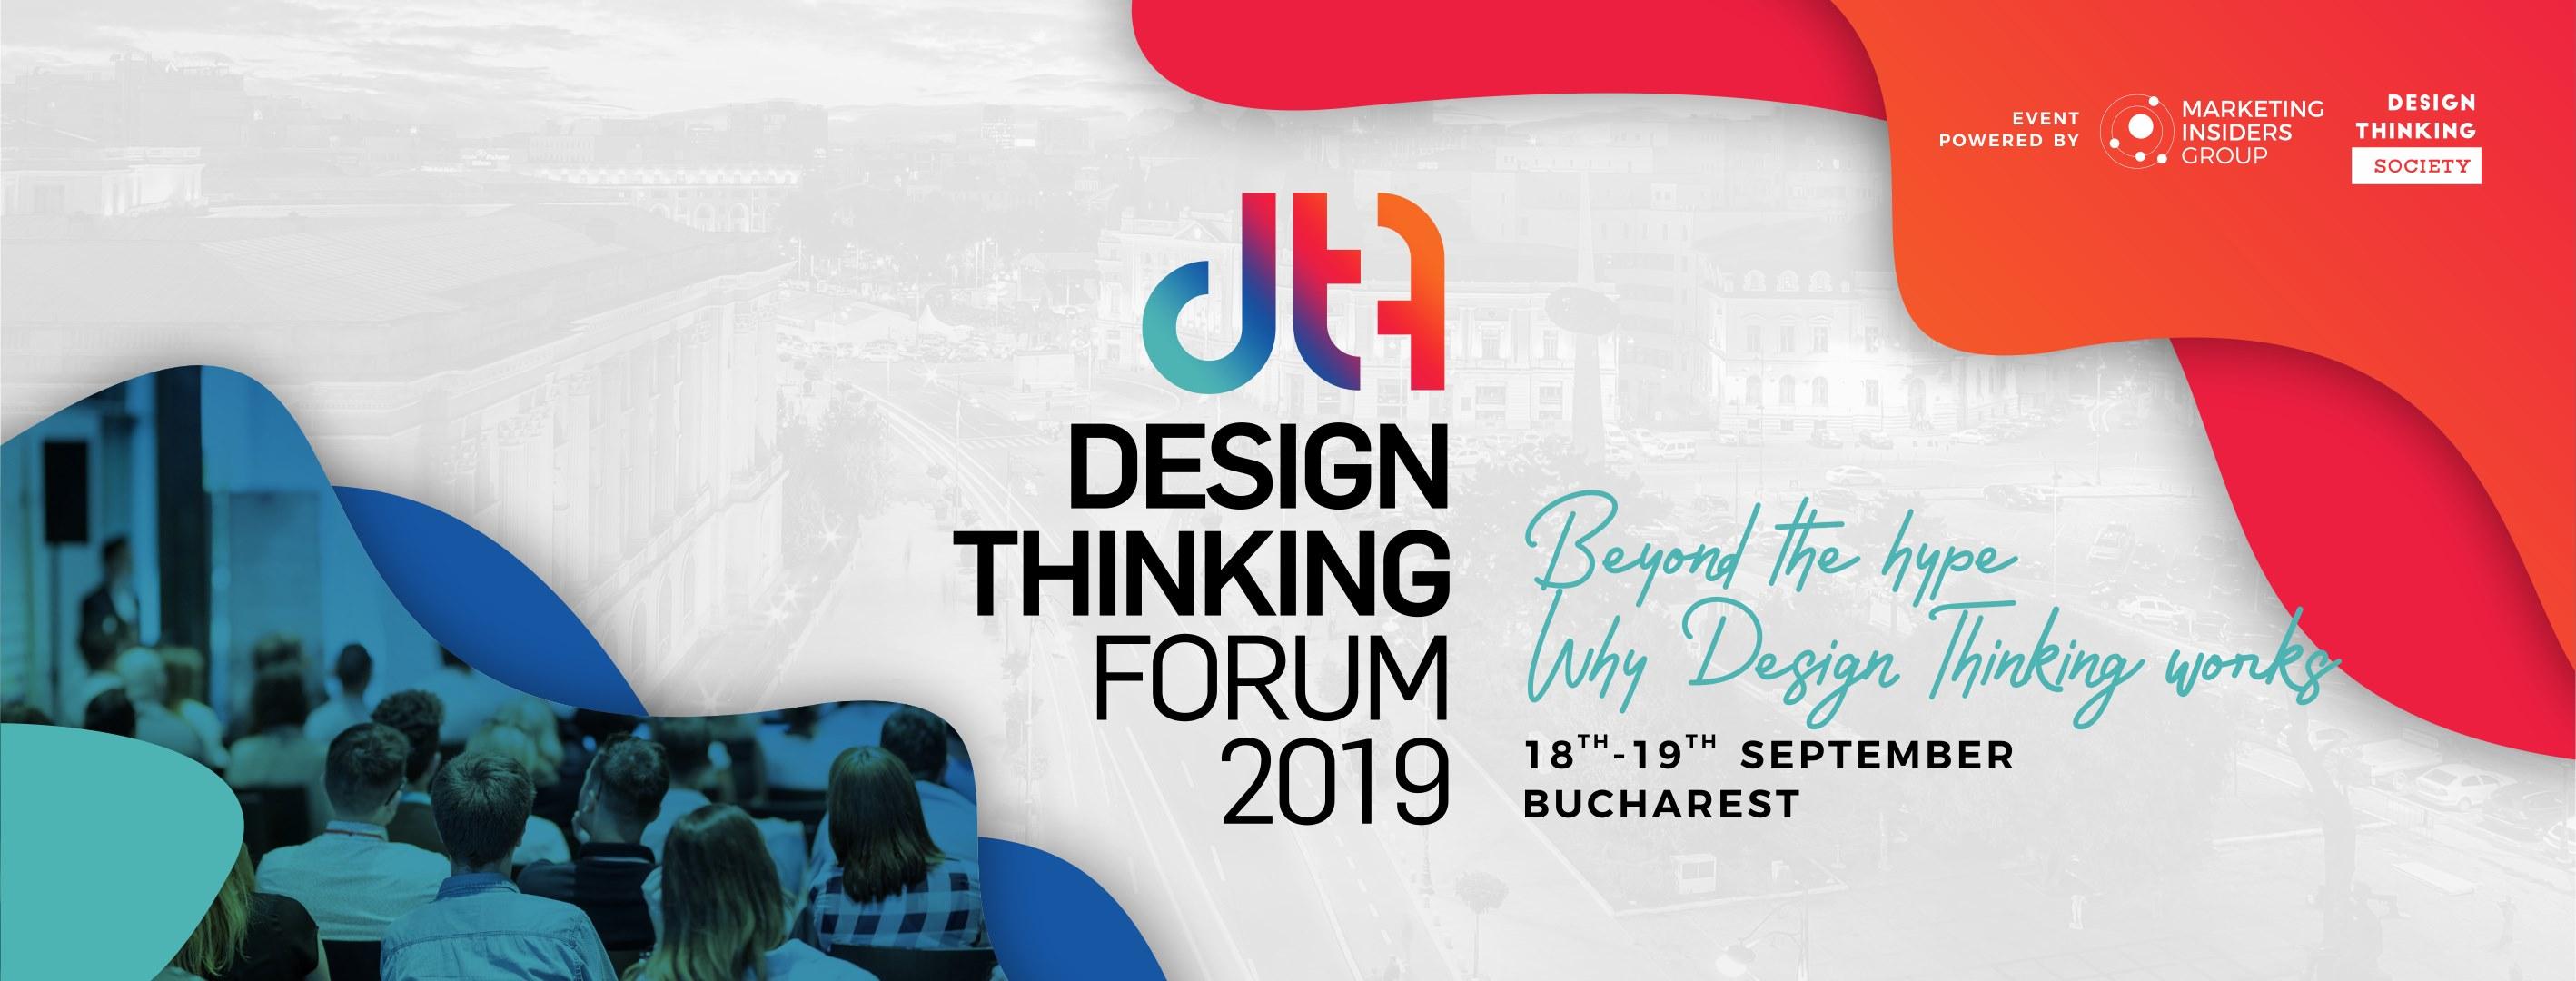 Design Thinking Forum 2019